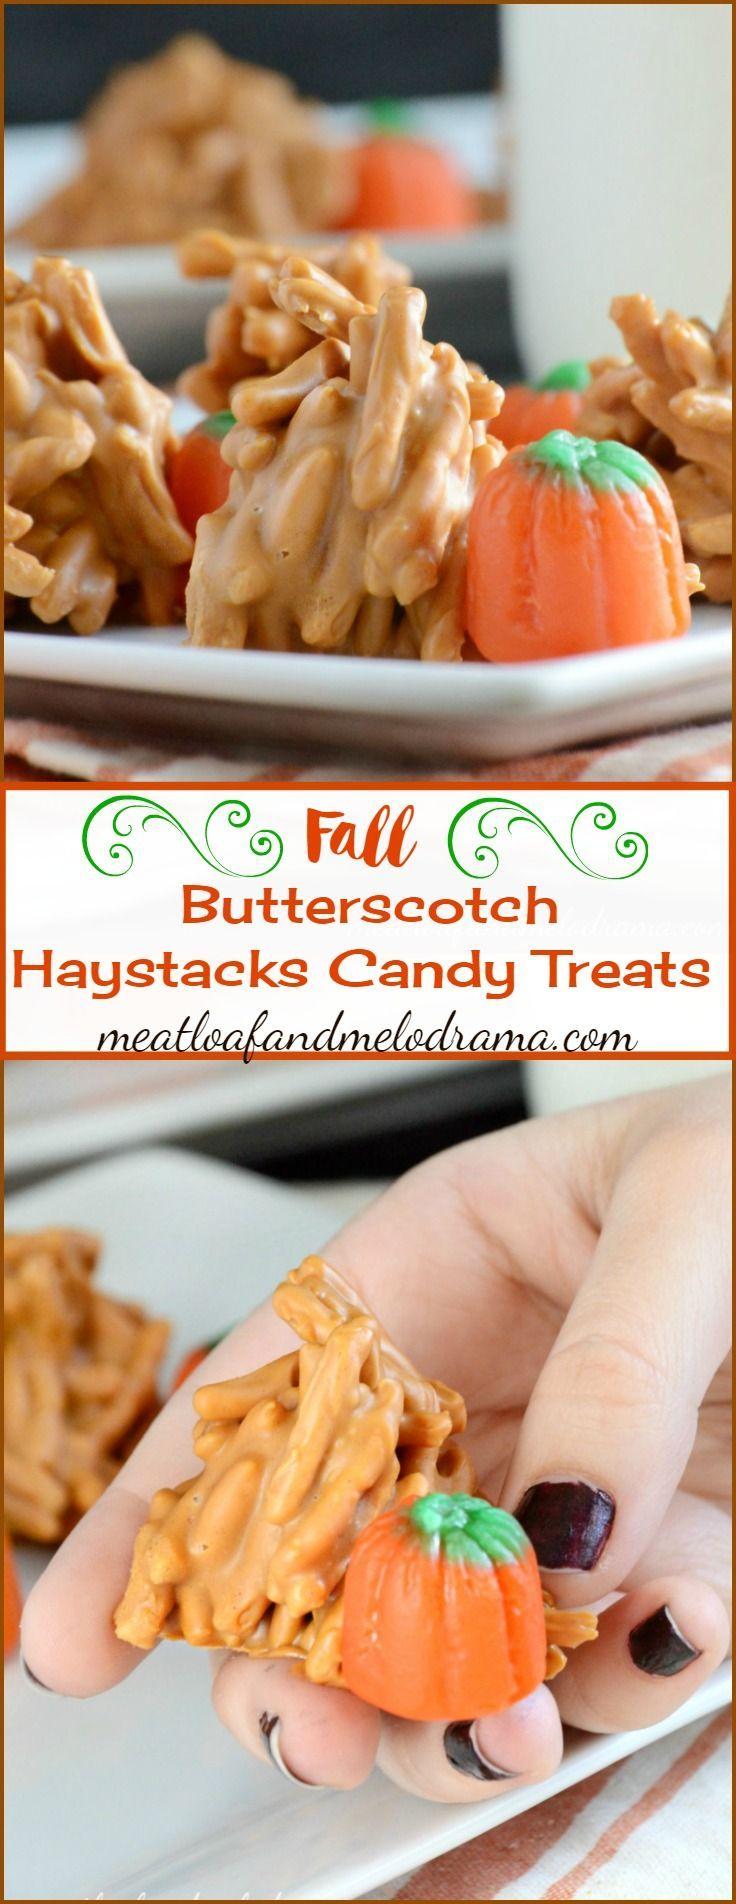 Butterscotch Haystacks Candy Treats